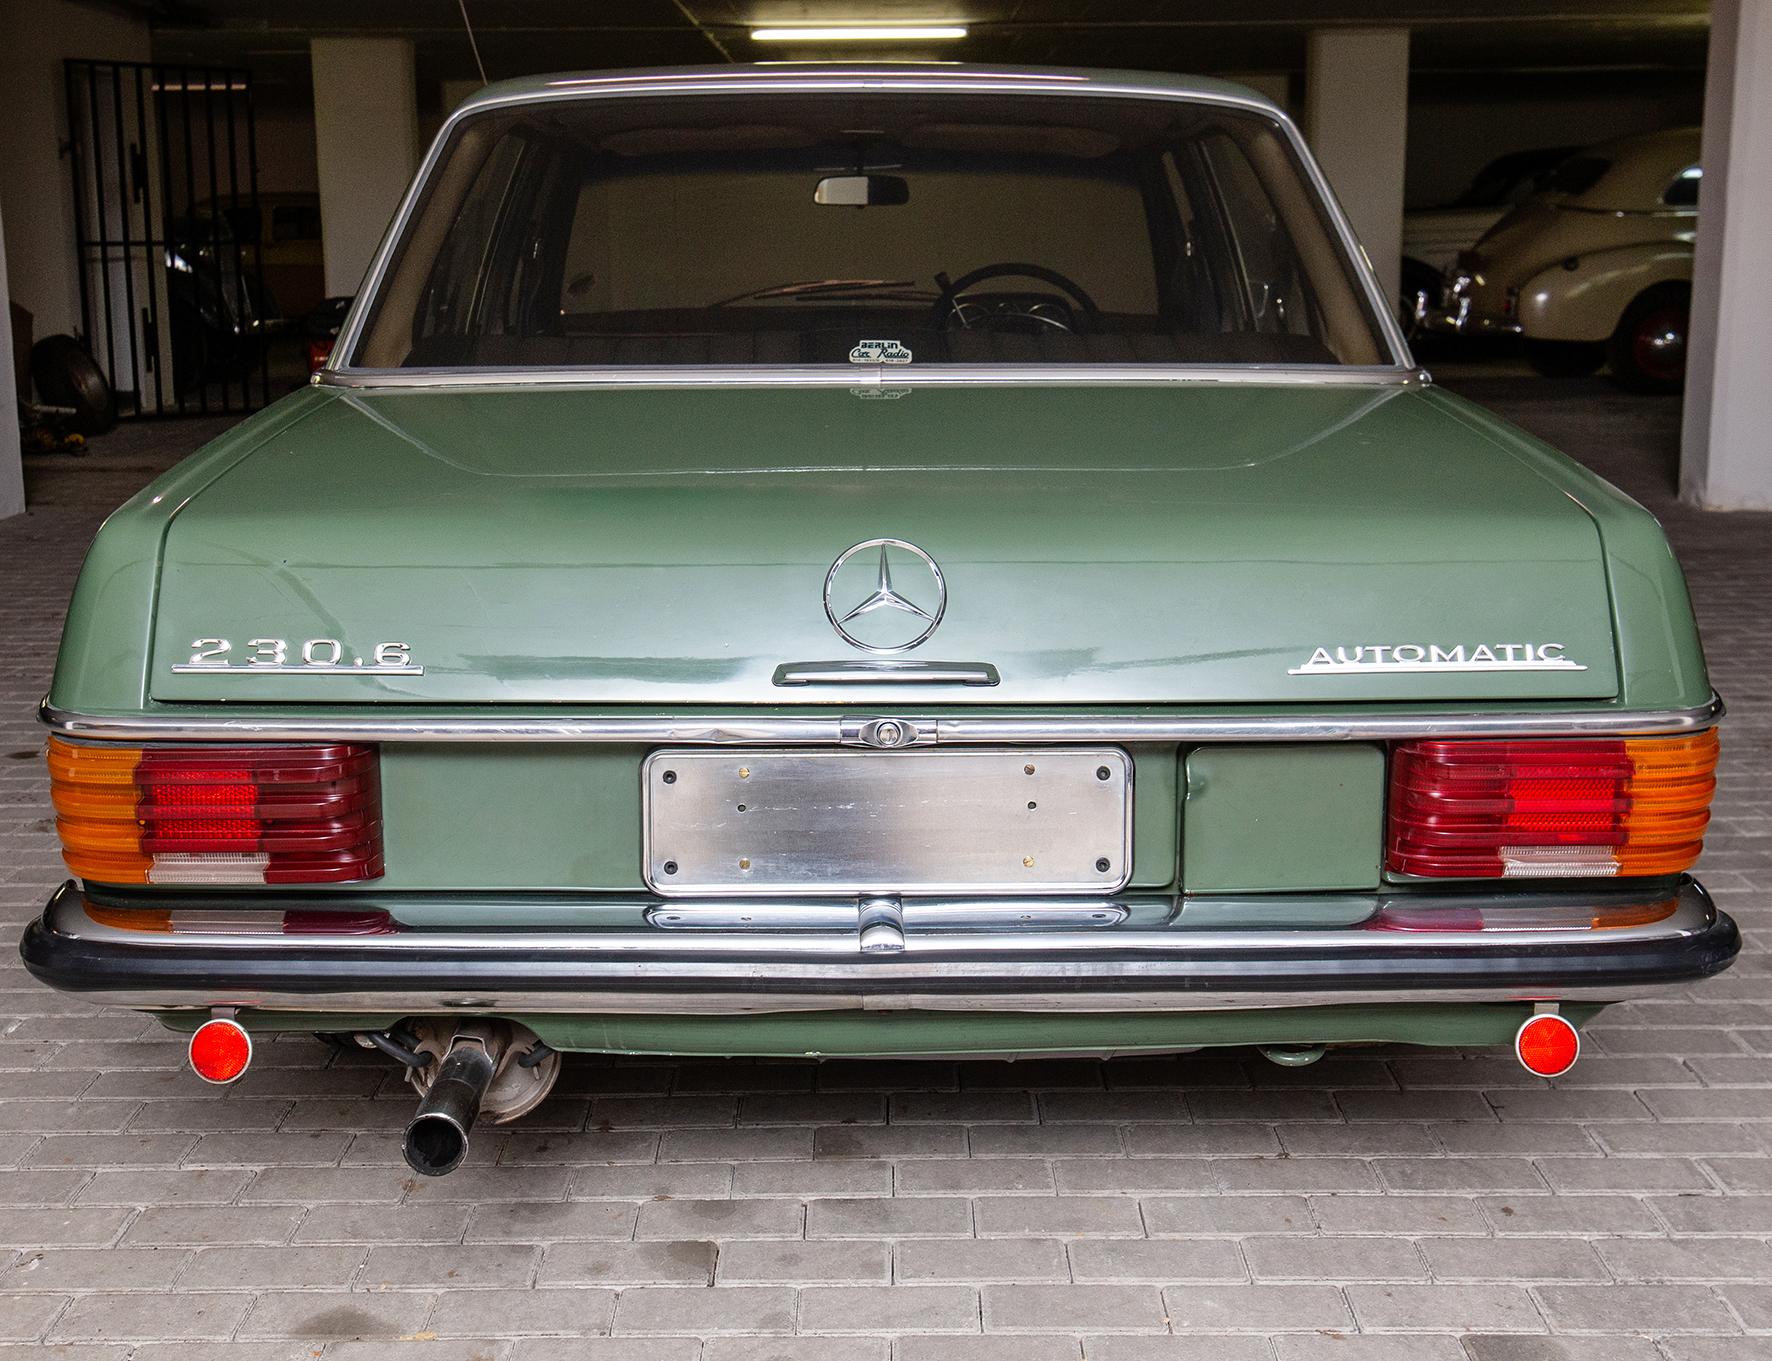 1971 Mercedes-Benz 230.6